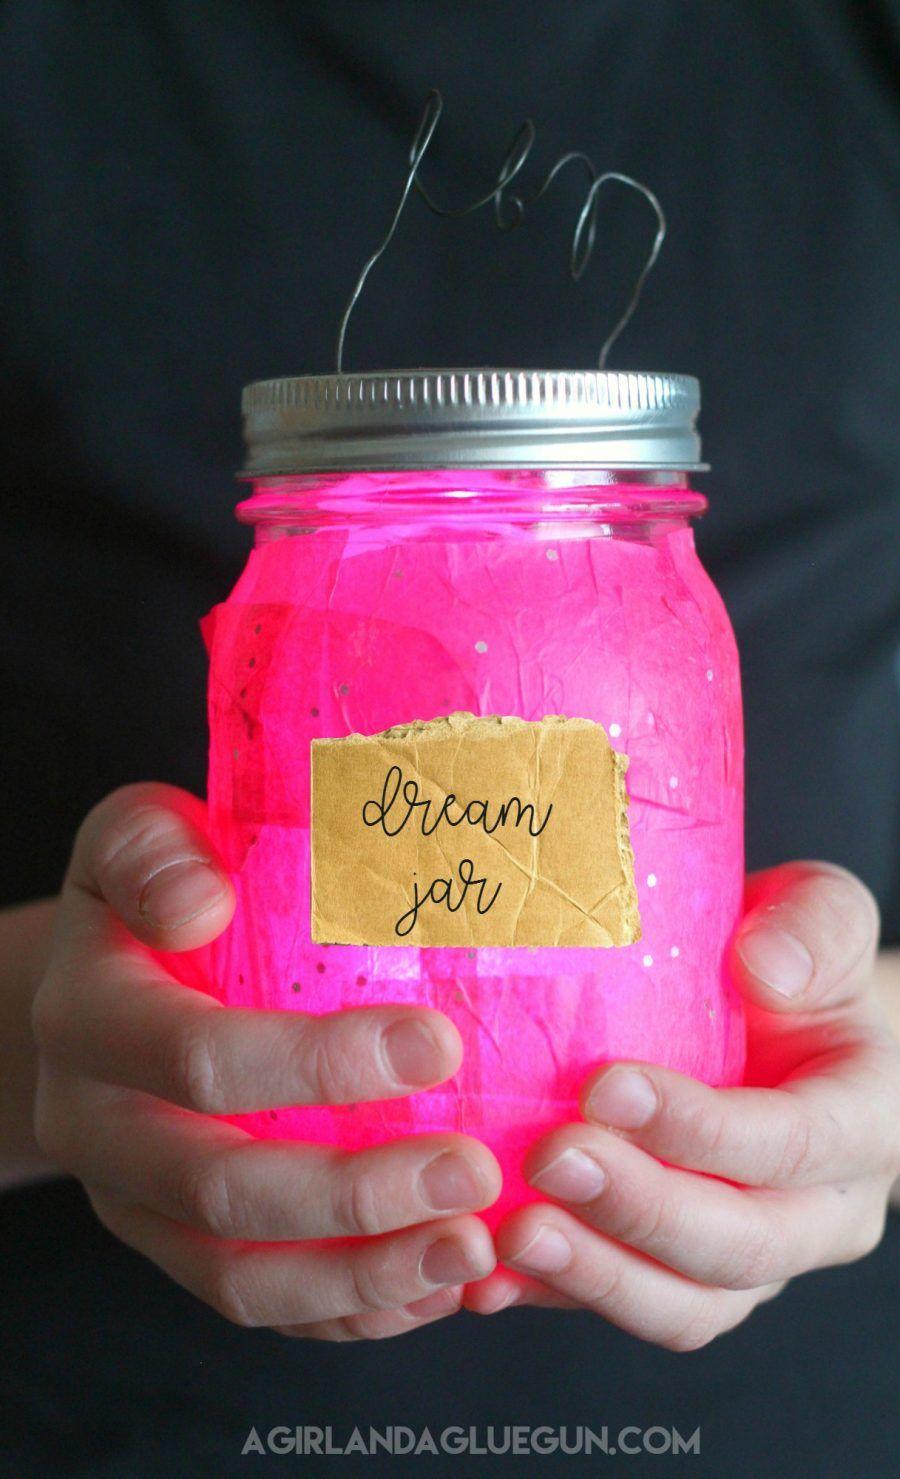 Fun glowing dream jars from Disney's The BFG